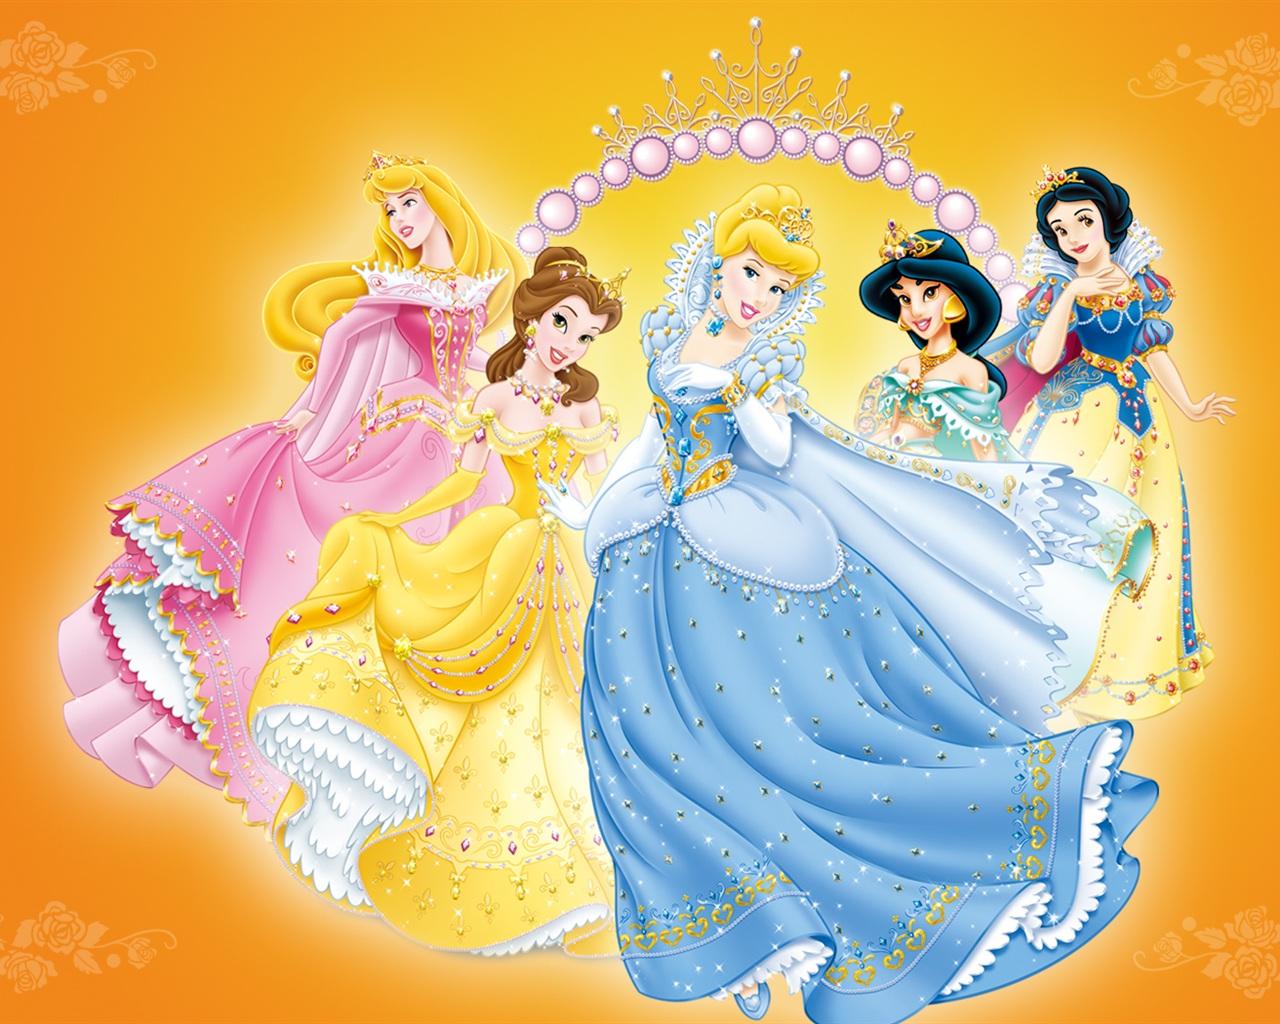 princess-dress-show_1280x1024